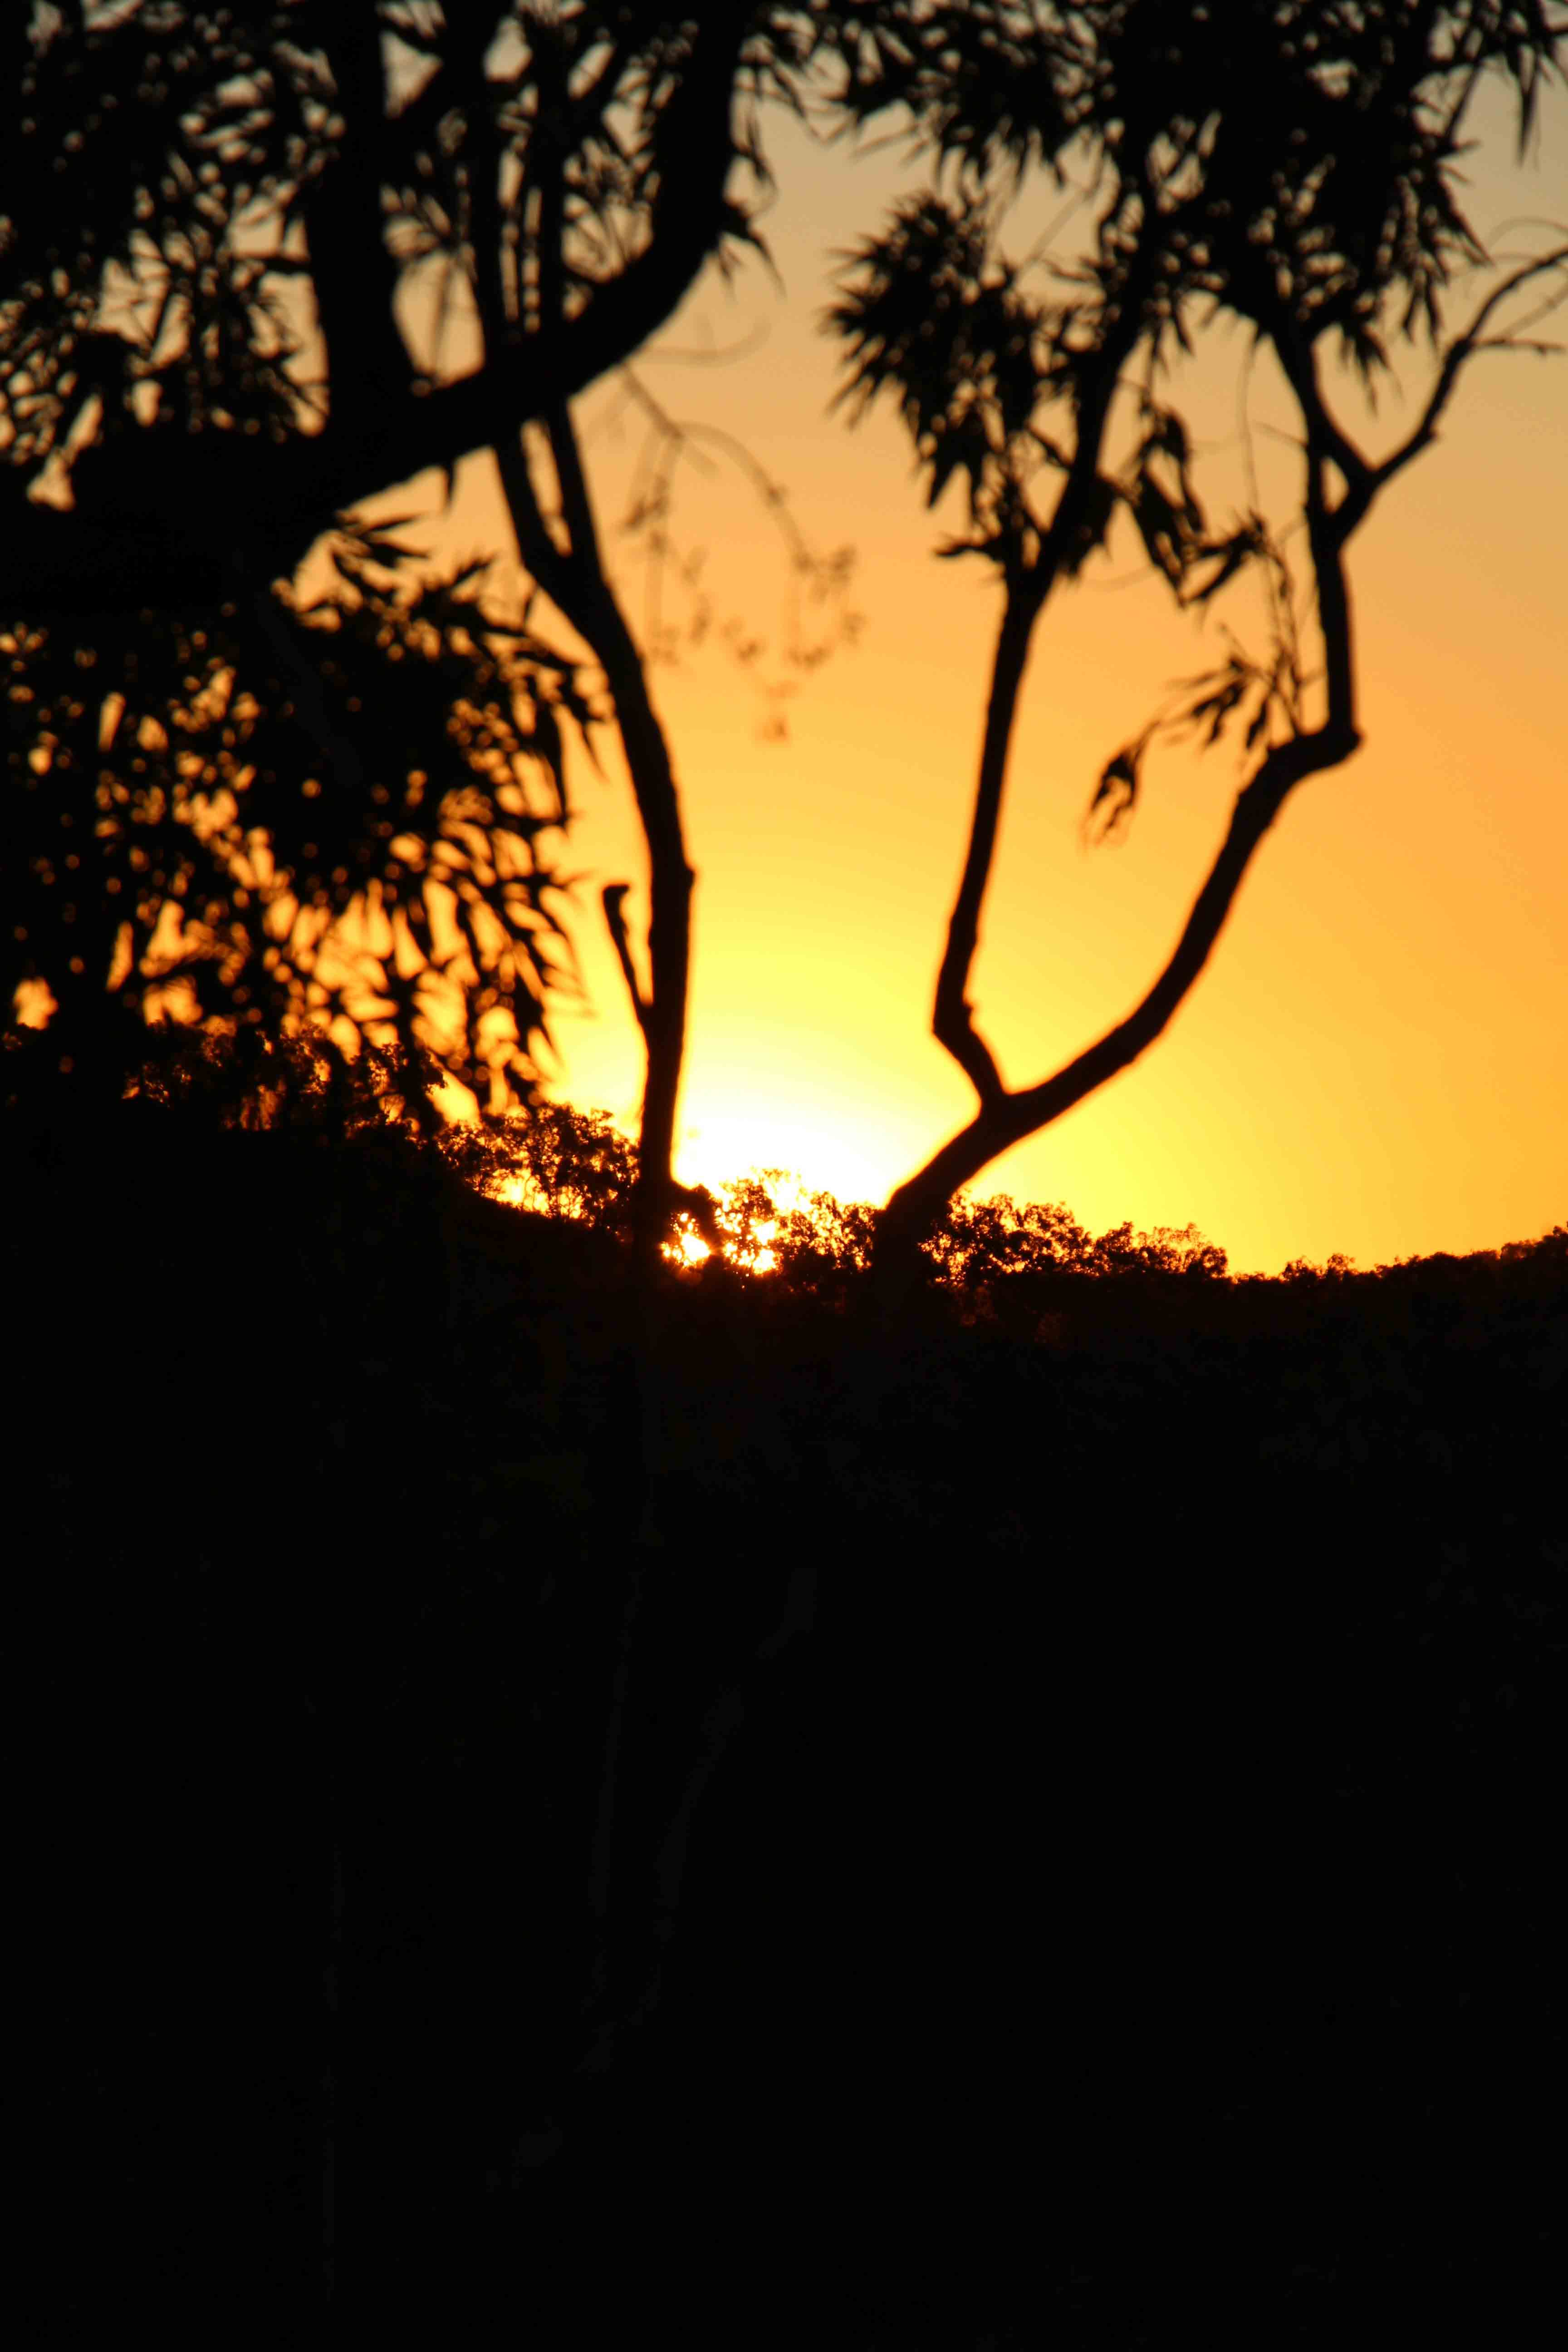 Sunset over Western Australian bush